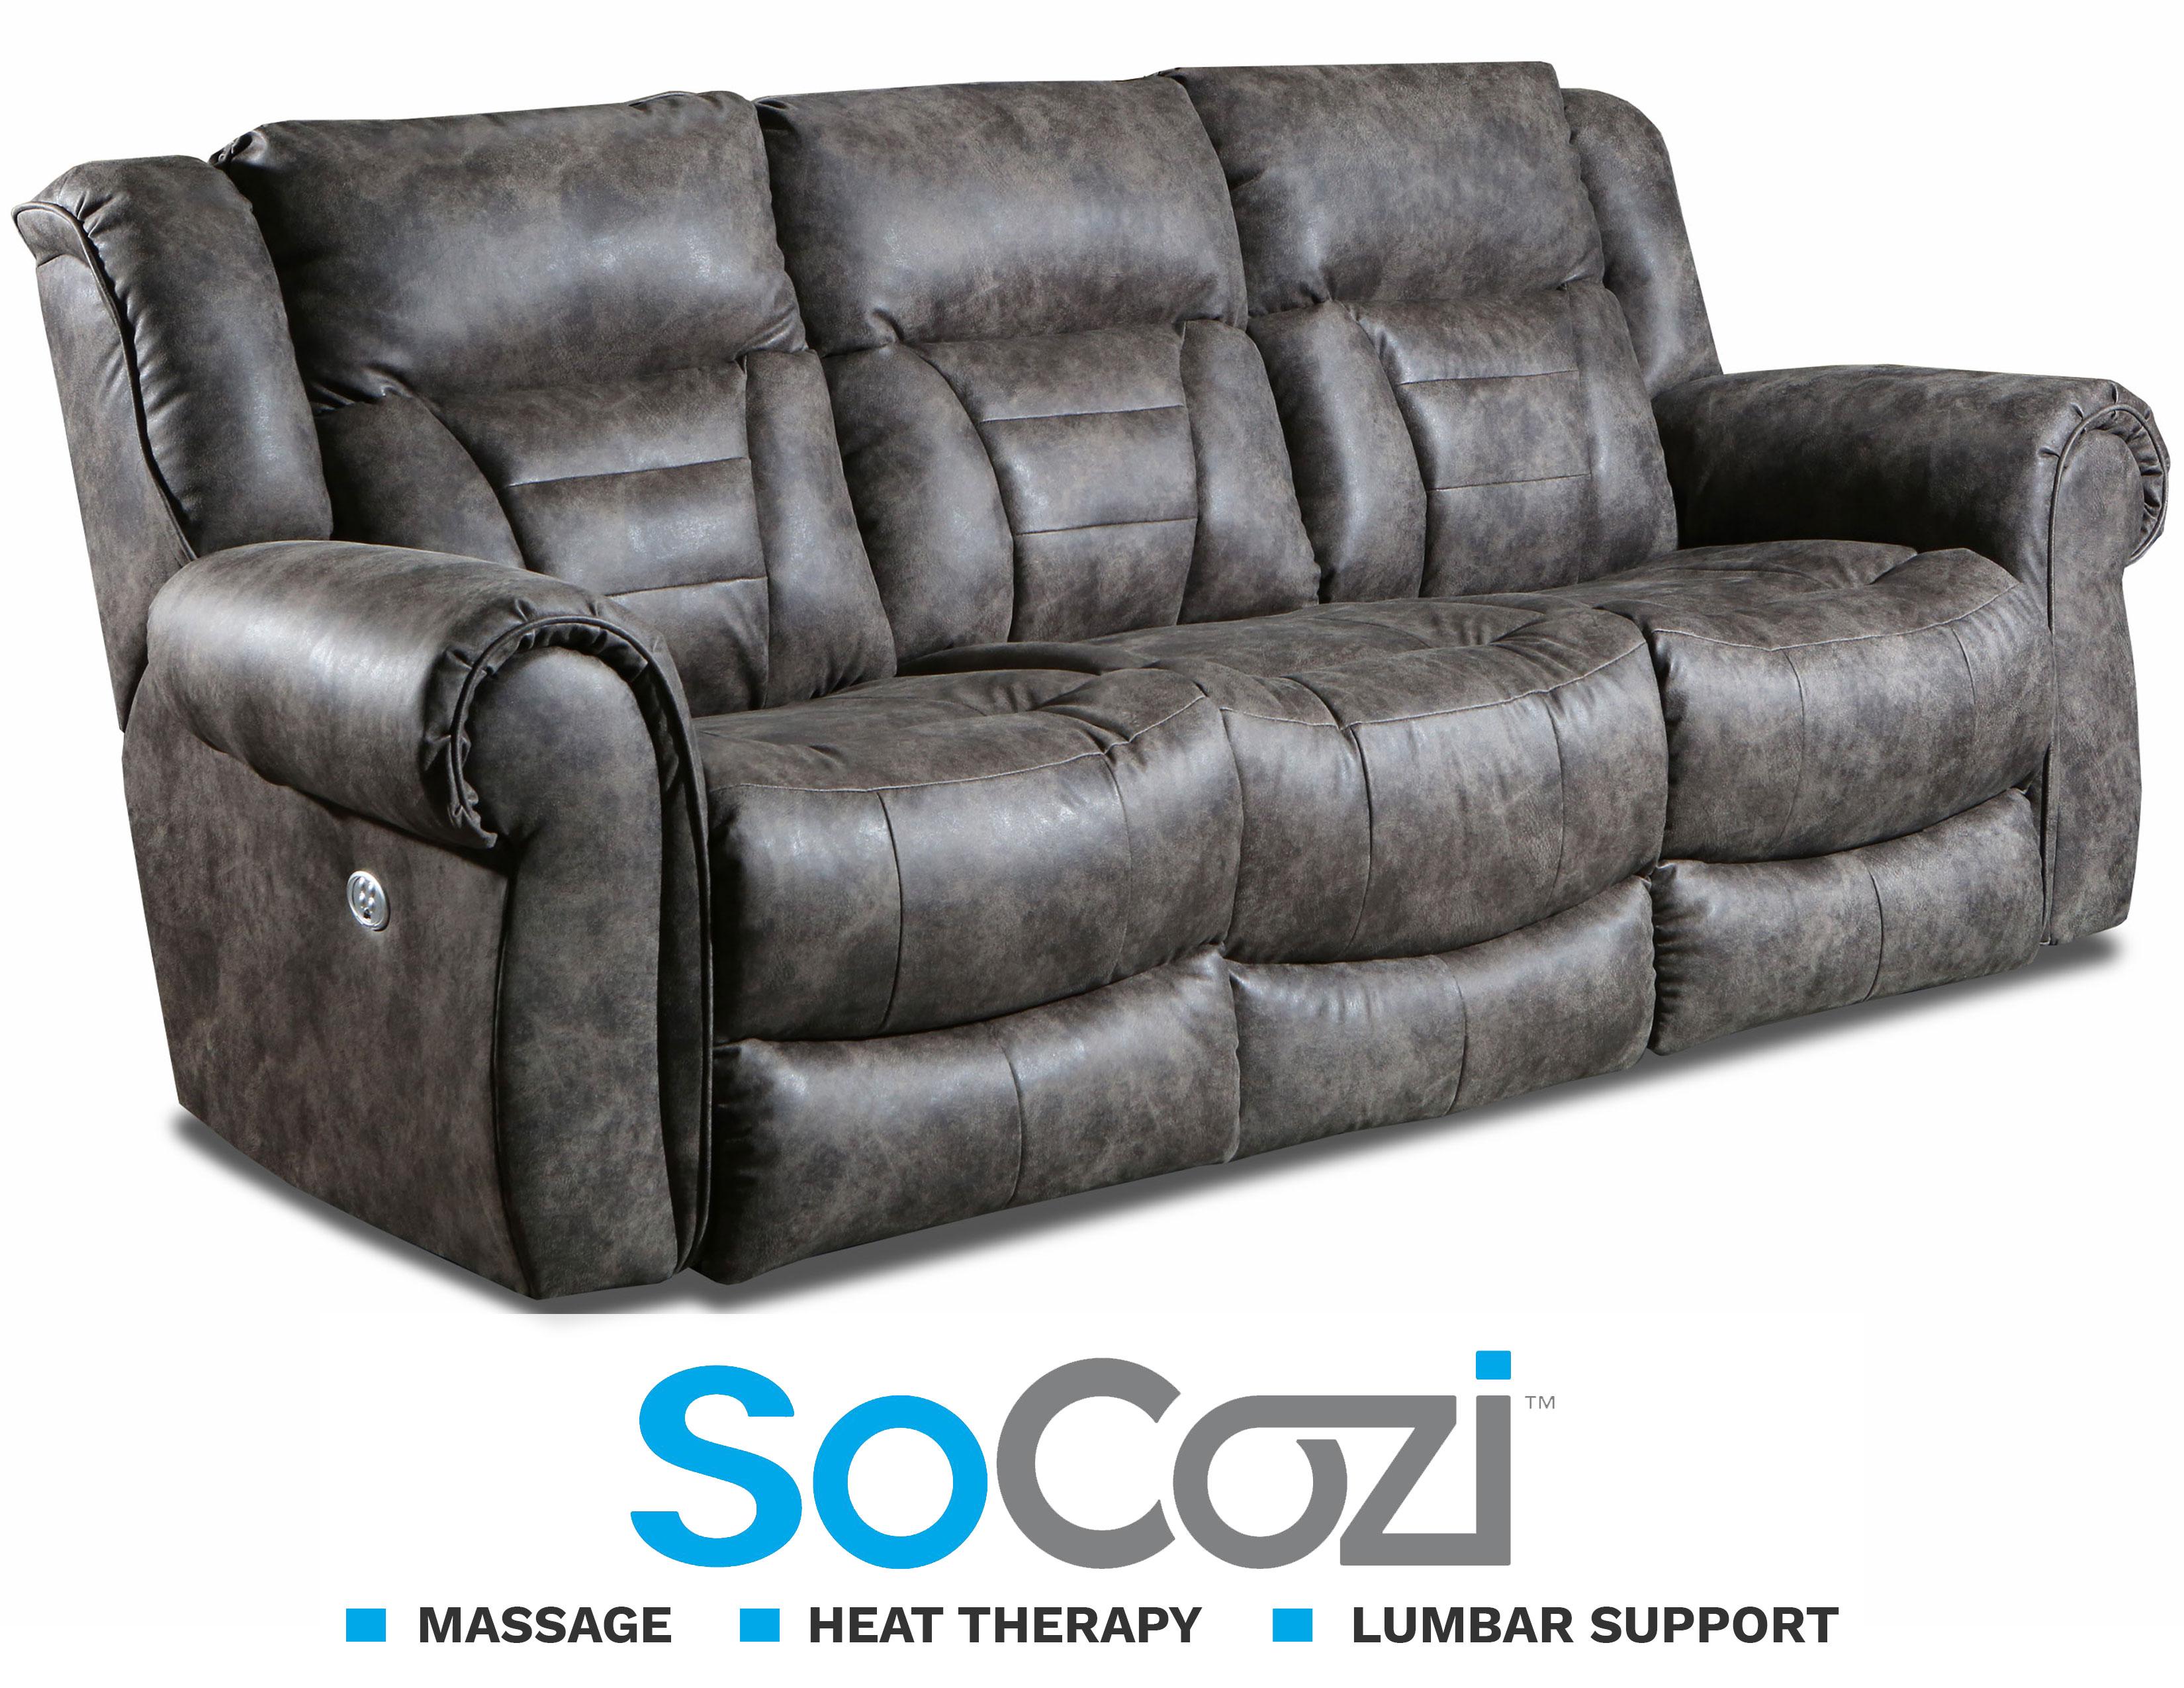 Pleasing Titan Reclining Sofa W Massage Heat Lumbar Sofas And Unemploymentrelief Wooden Chair Designs For Living Room Unemploymentrelieforg